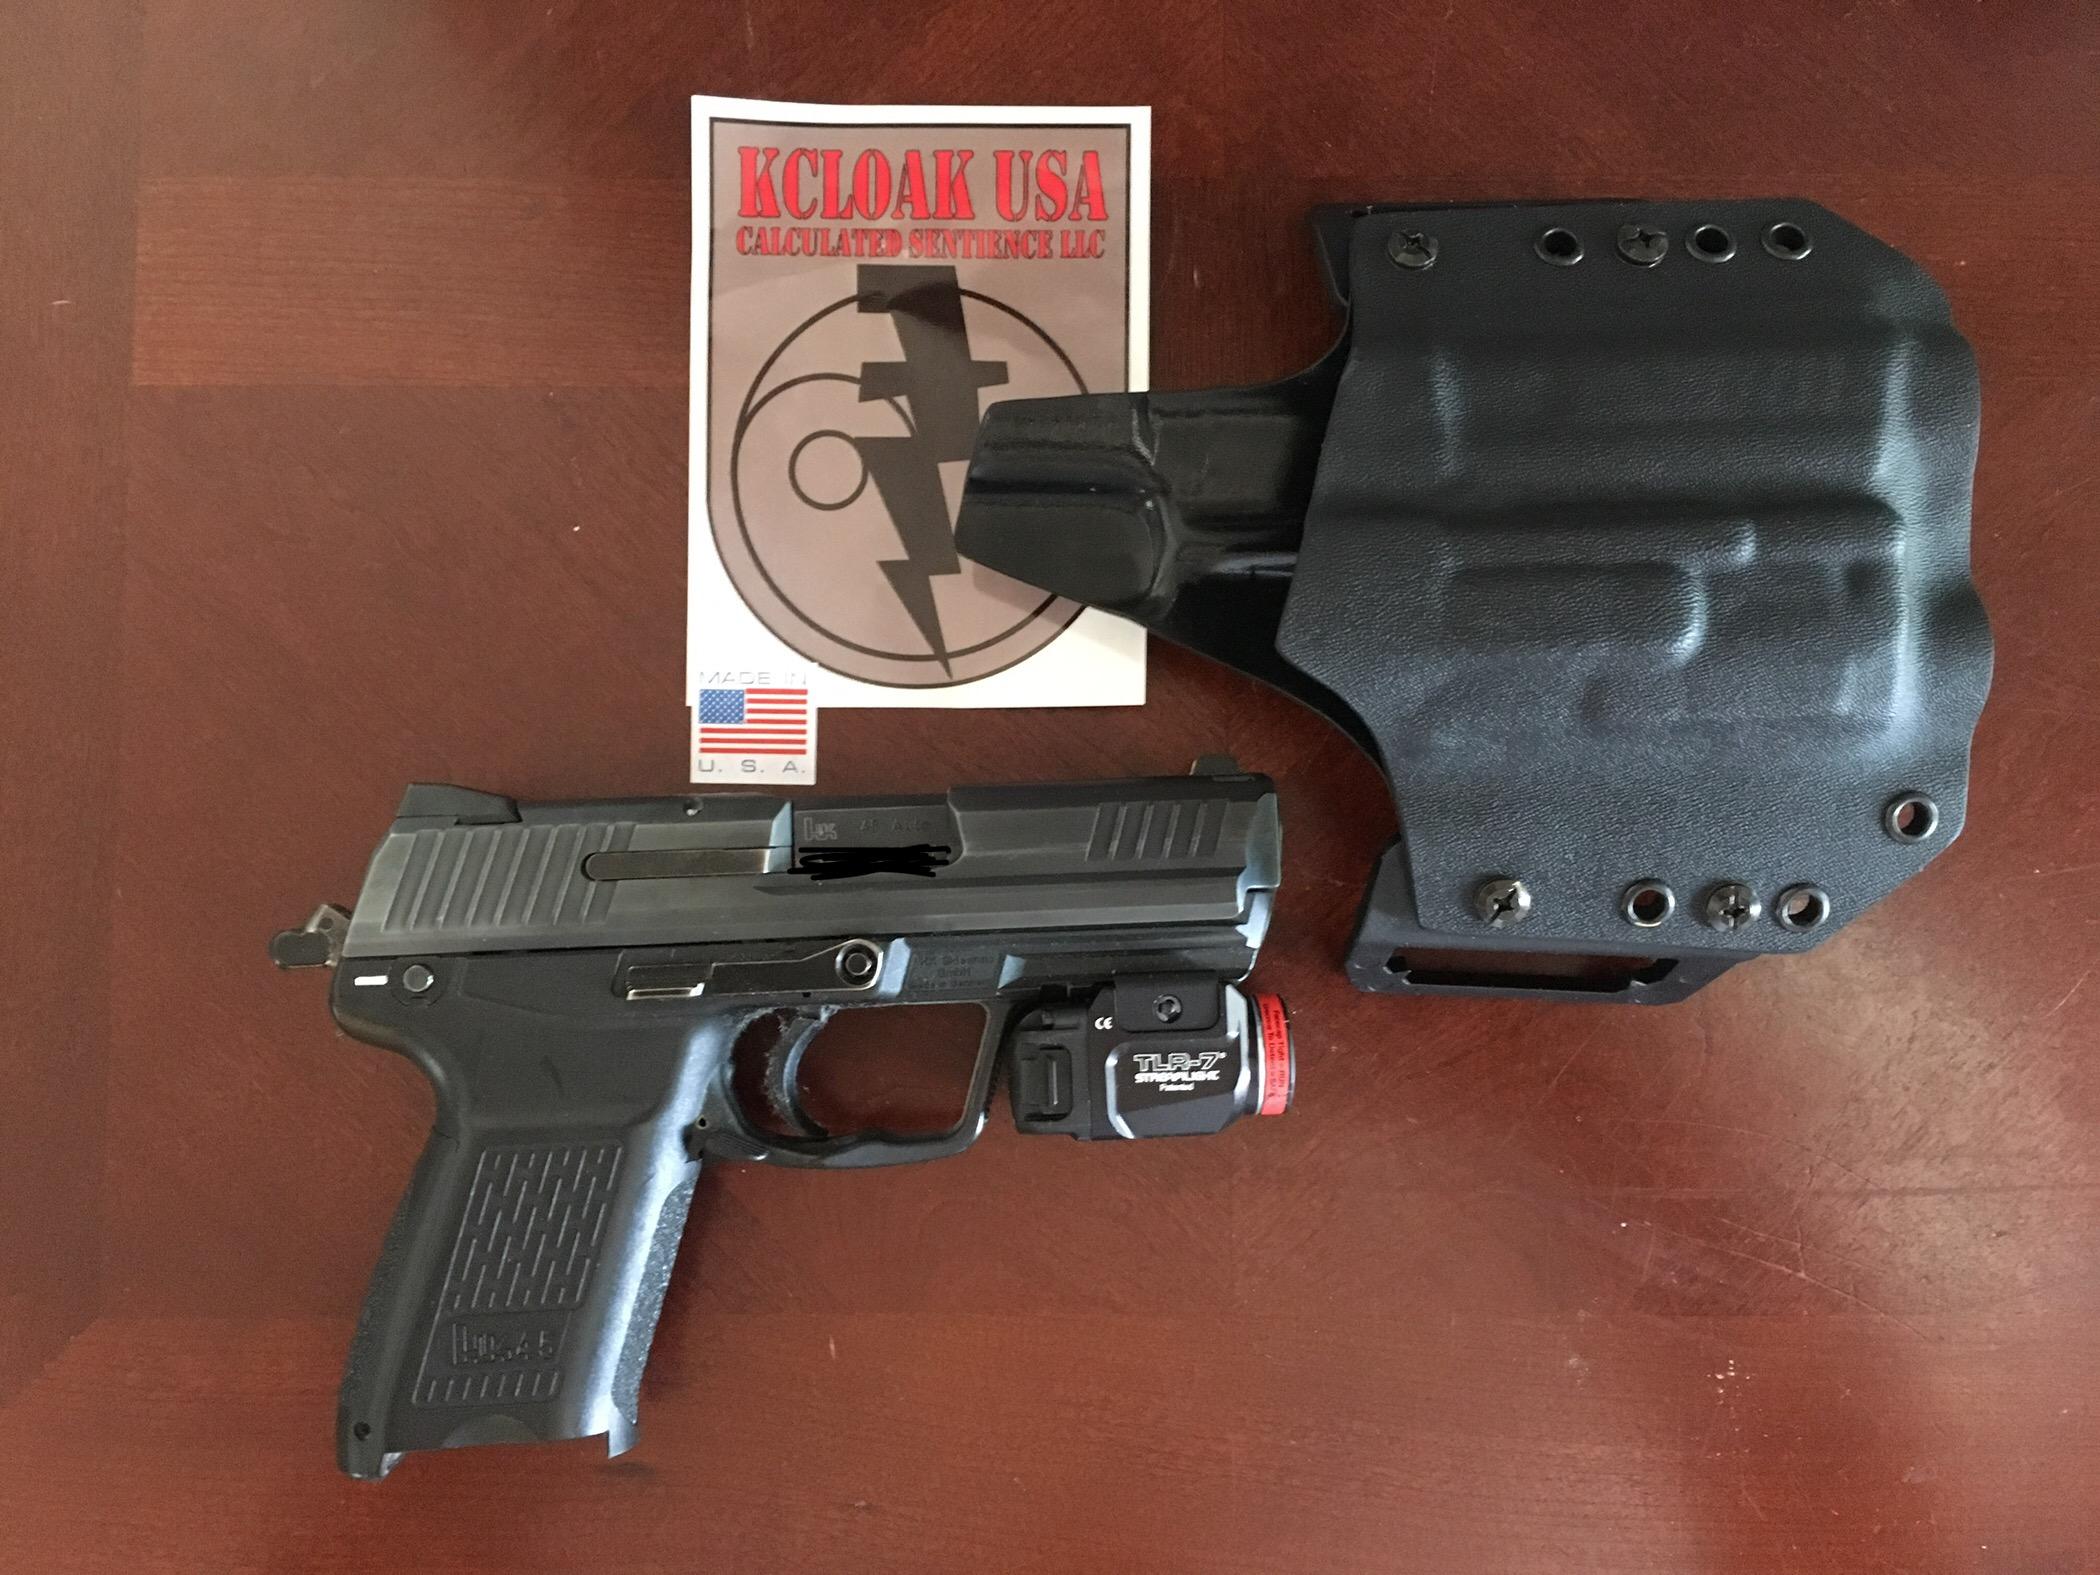 HK45C + TLR-7 + Kaluban Cloak holster-137d5c6d-eab3-48c9-a8f1-ad47ed29dd13.jpeg